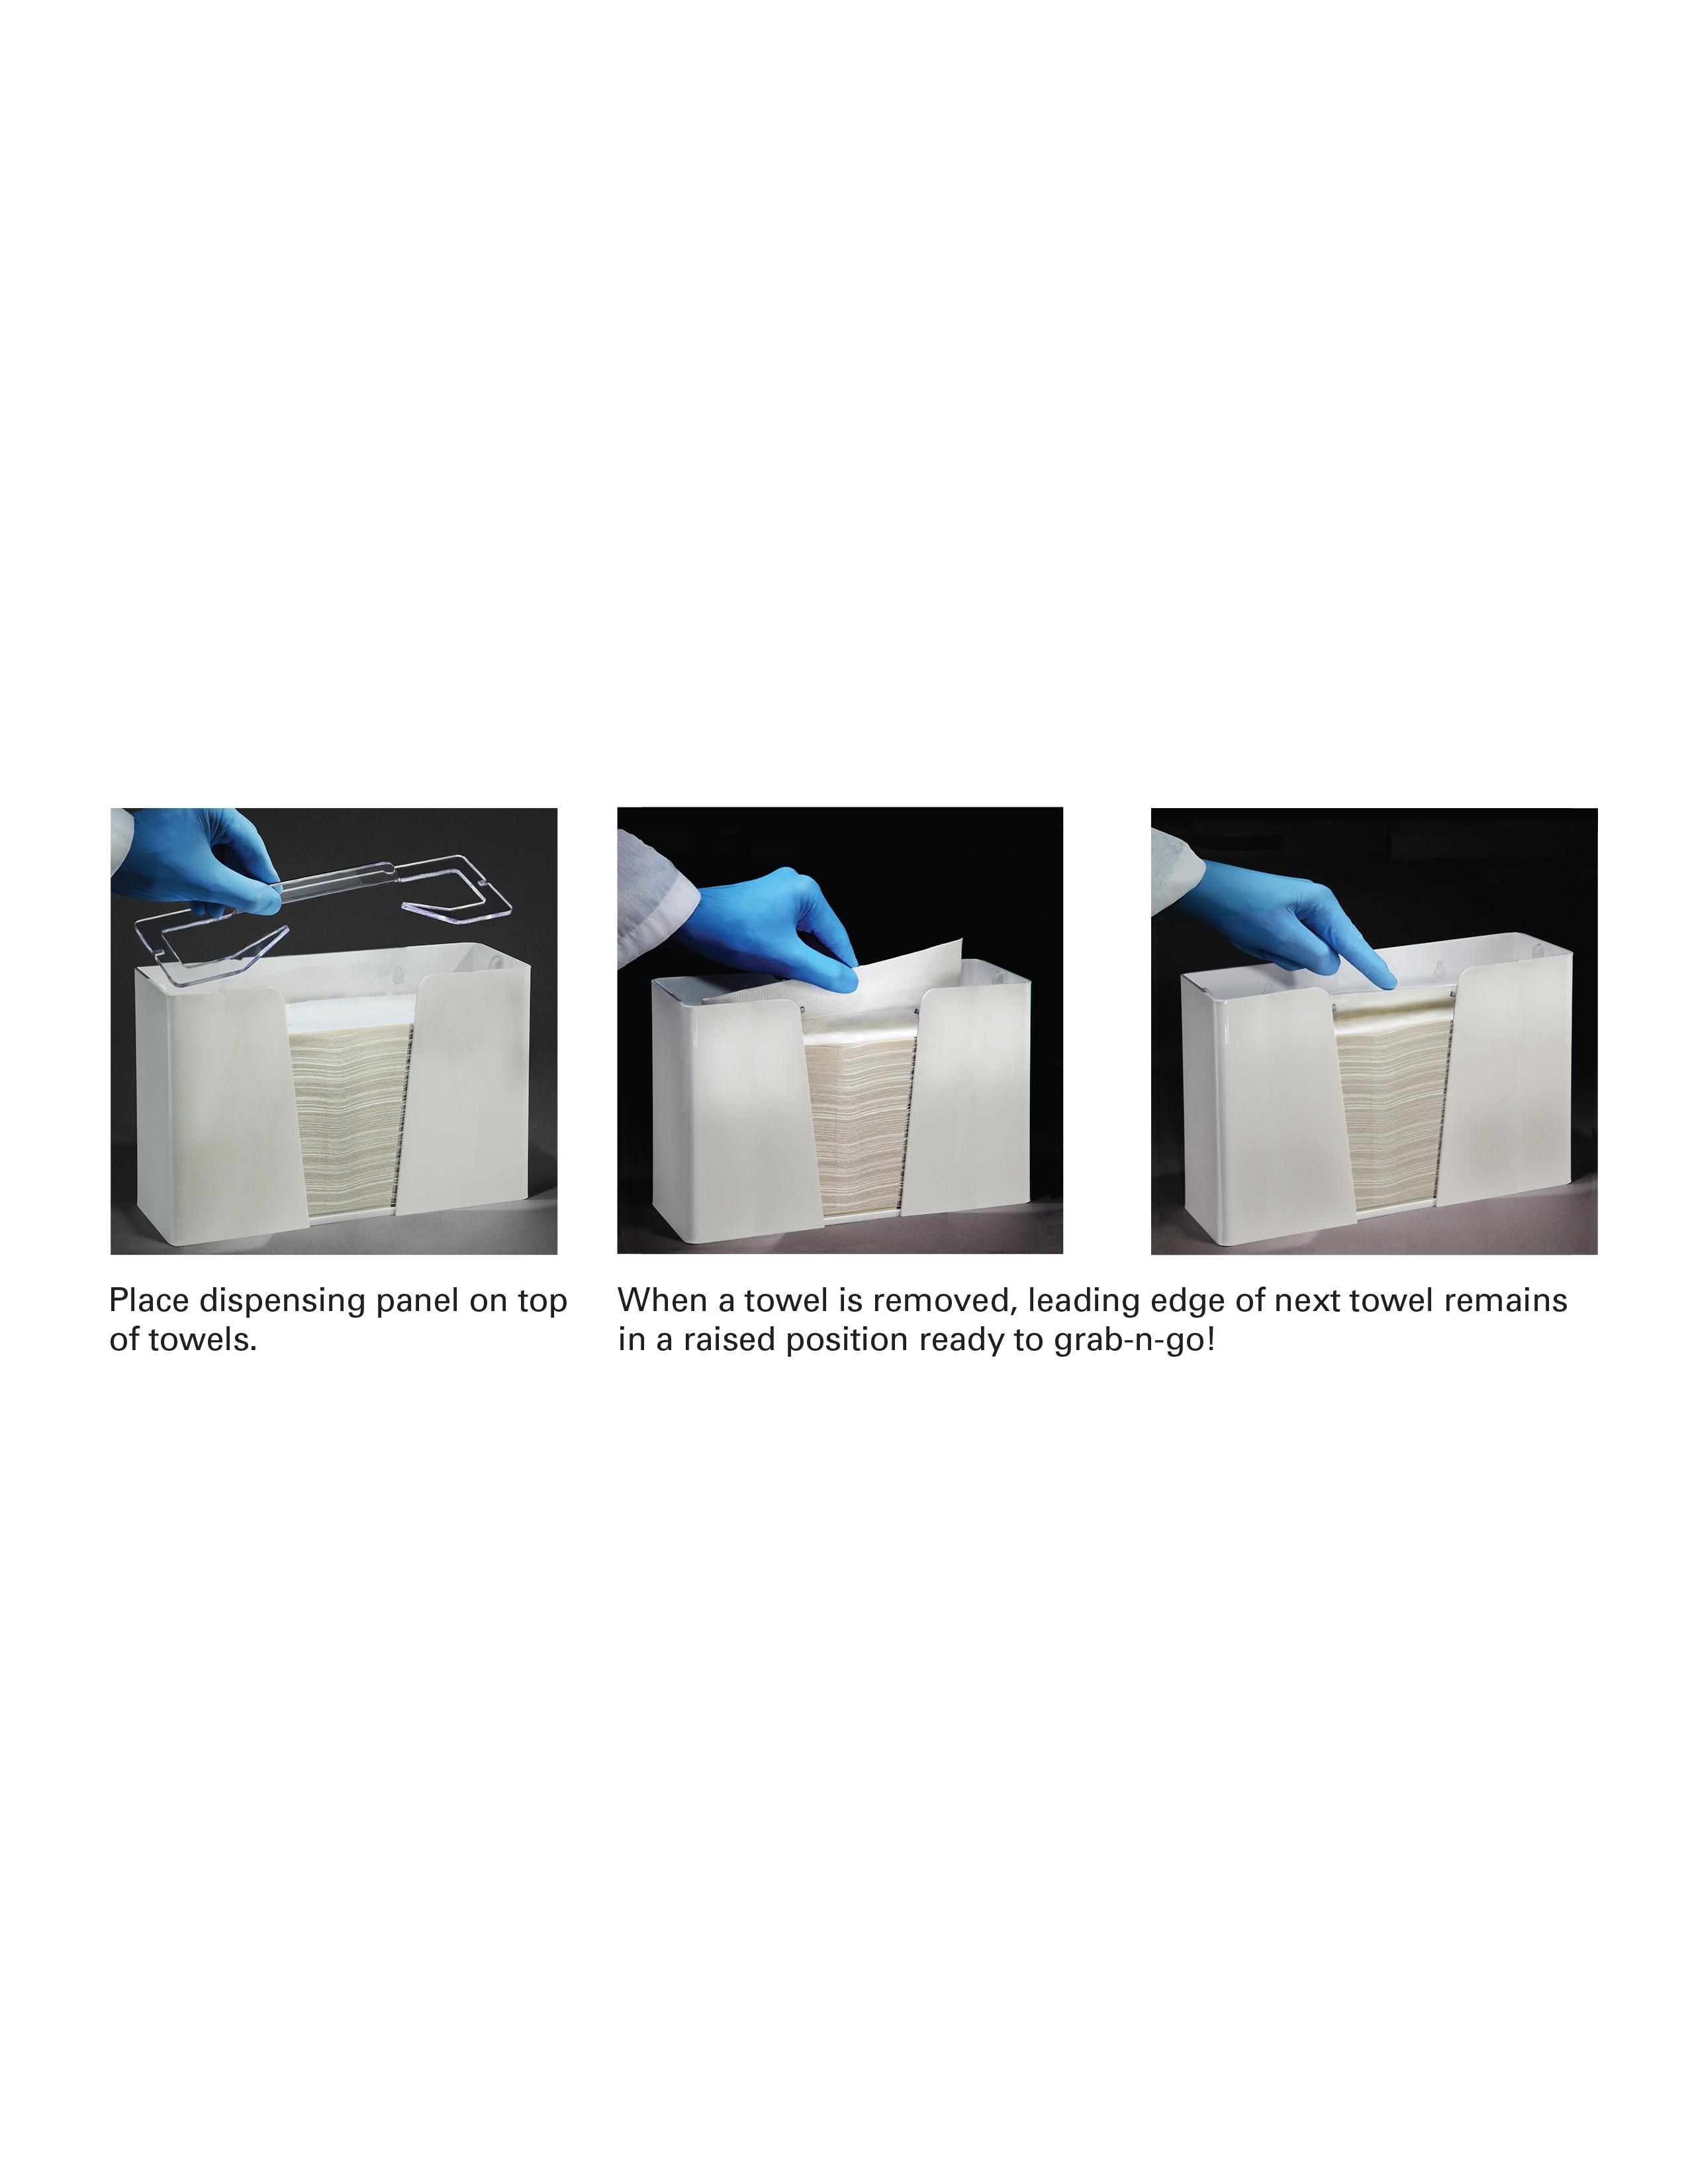 ReadyTowel Paper Towel Dispensers